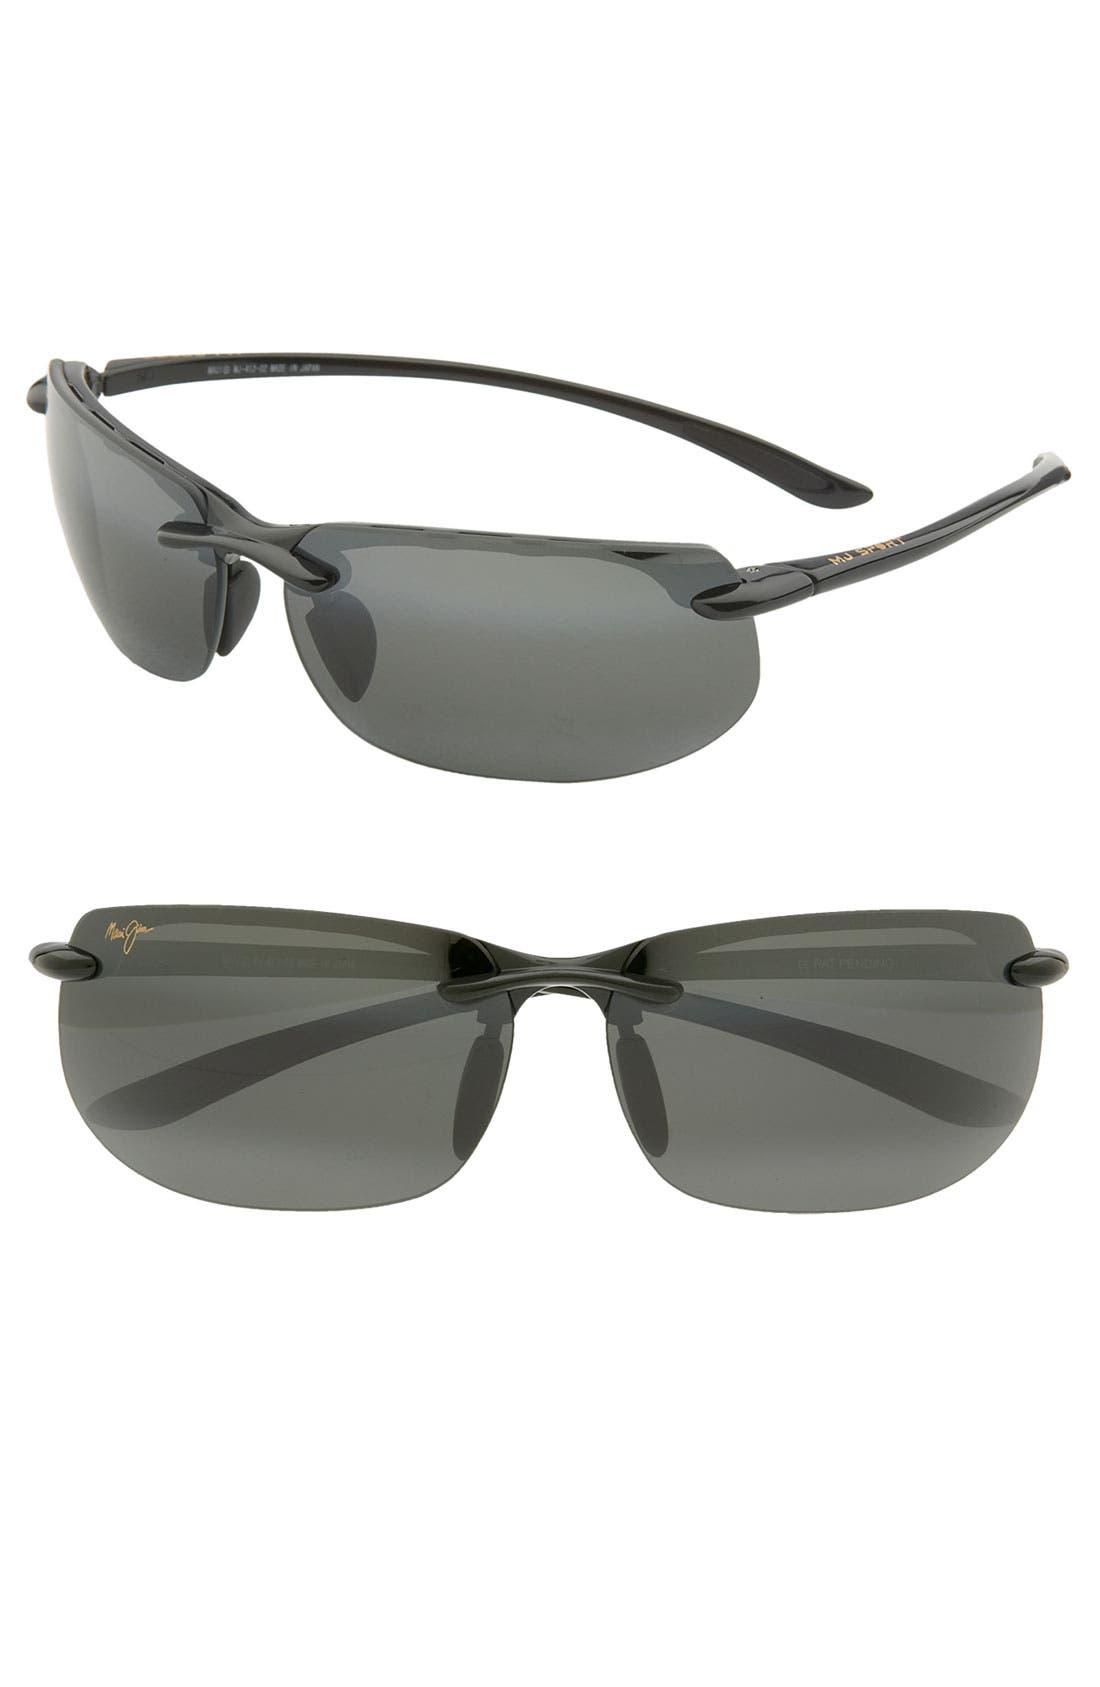 'Banyans - PolarizedPlus<sup>®</sup>2' 67mm Sunglasses,                             Main thumbnail 1, color,                             GLOSS BLACK / NEUTRAL GREY